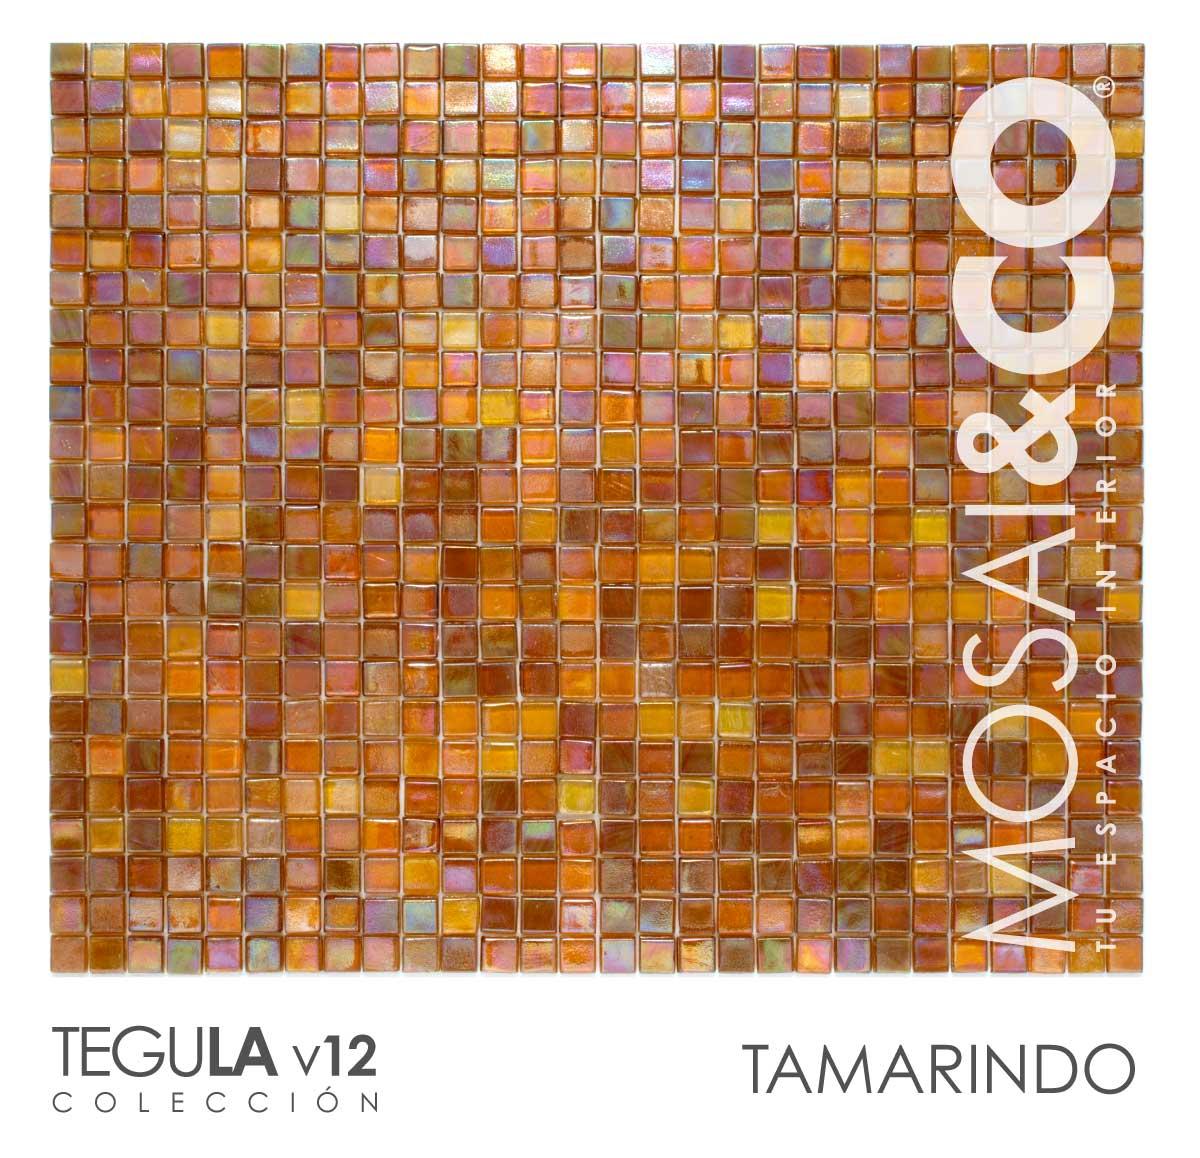 mosaico-interiores-mosaiandco-tegula-v12-tamarindo